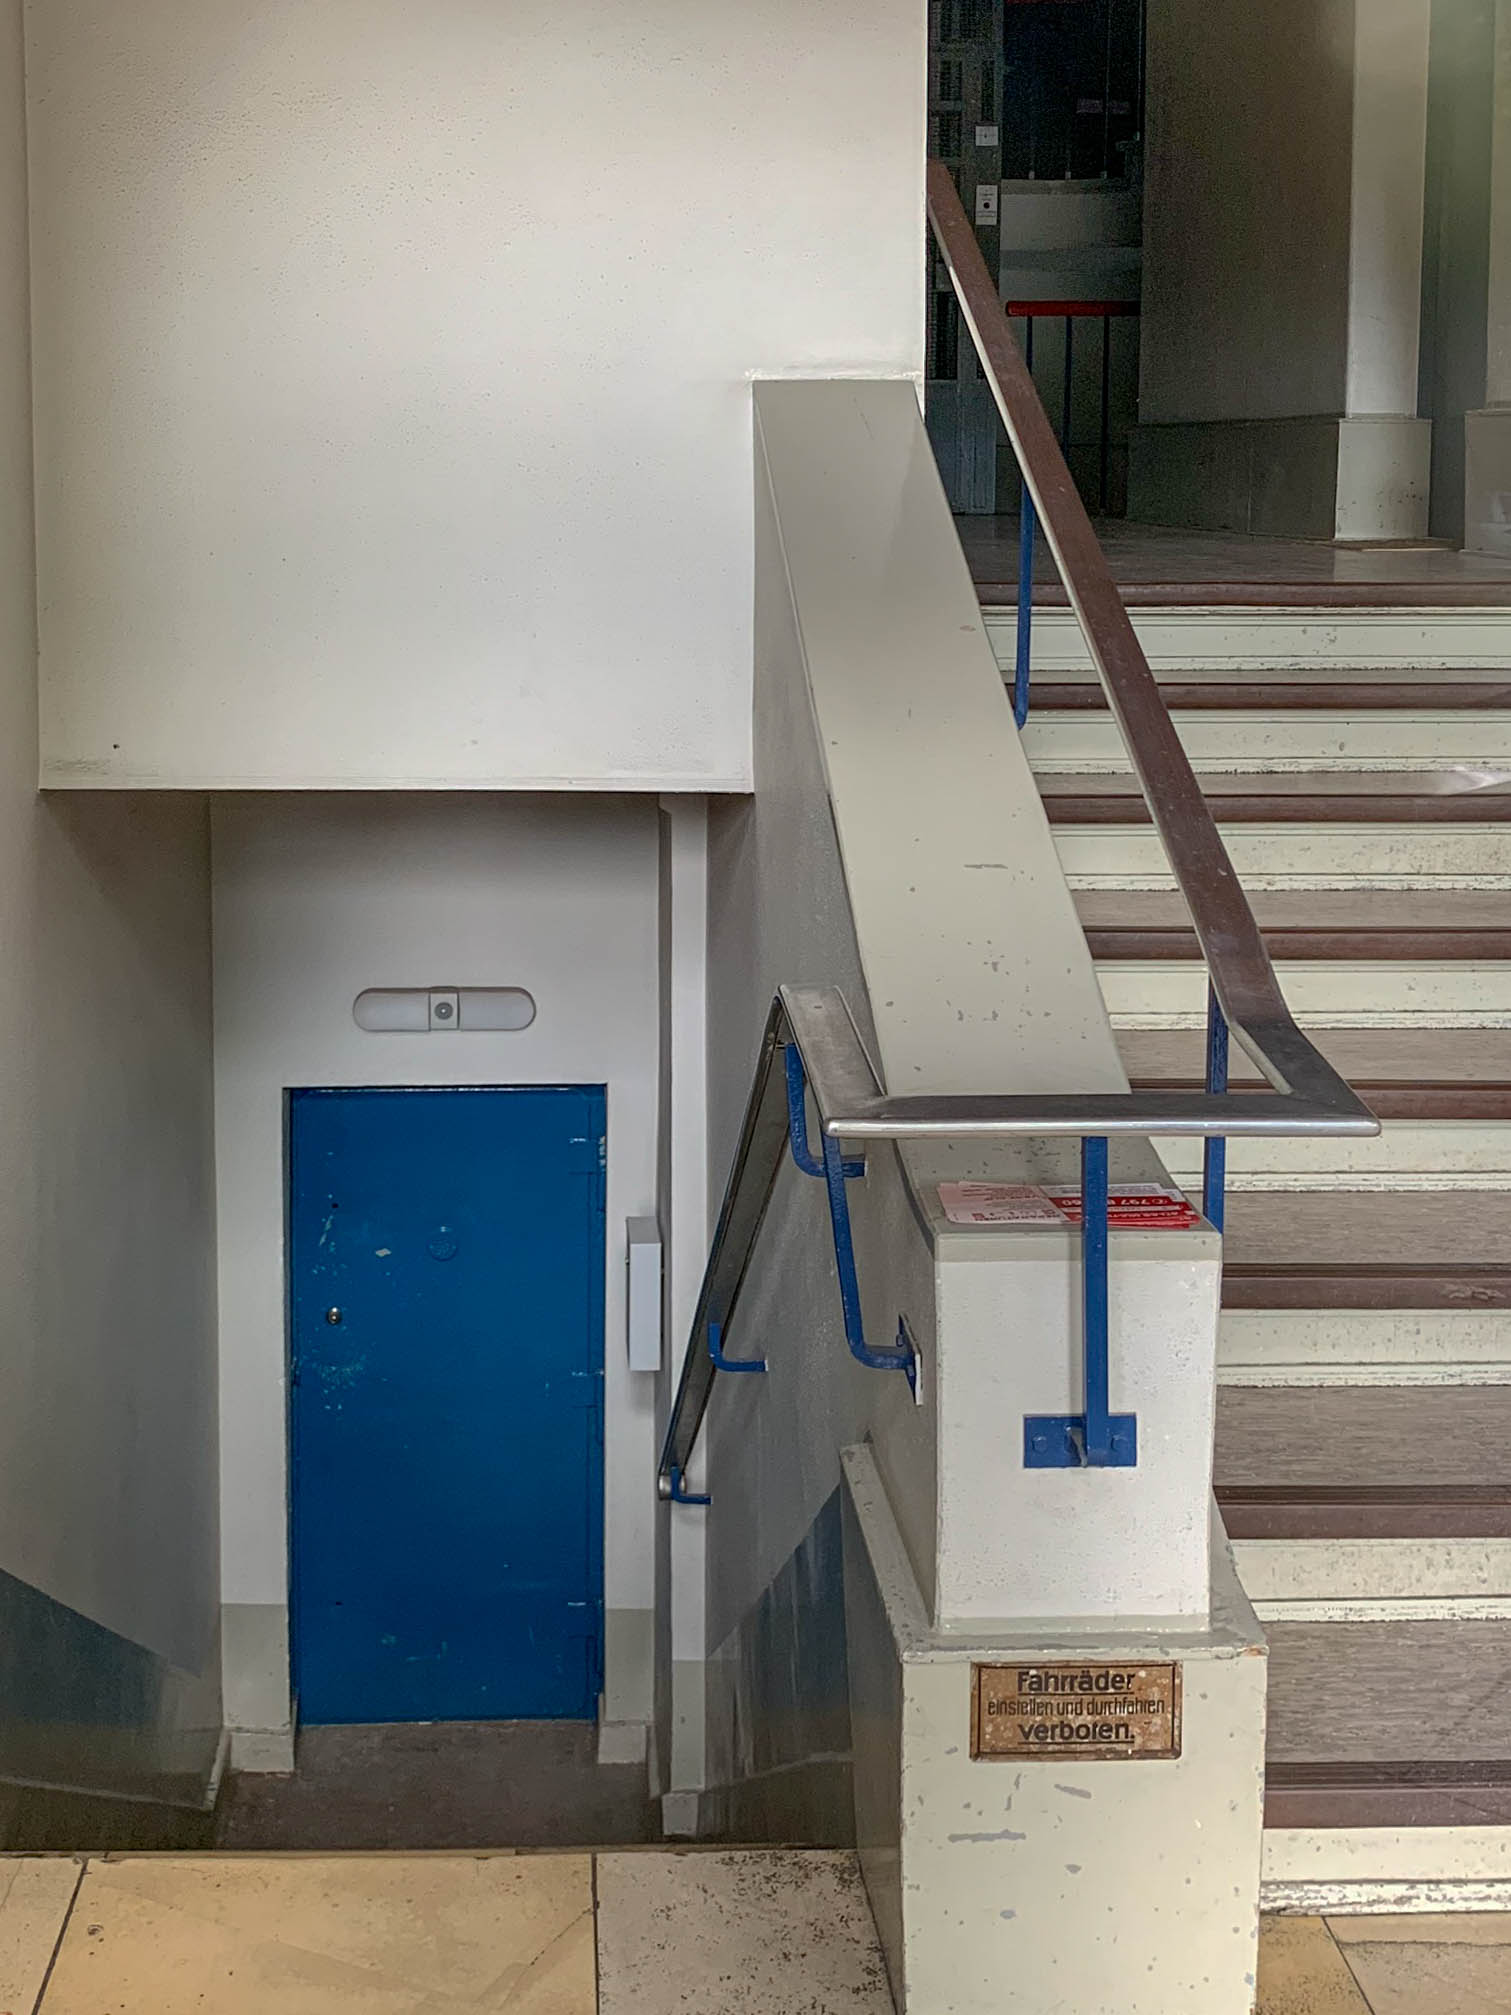 Apartement Building, 1929-1931. Architects: Hans Scharoun, Georg Jacobowitz